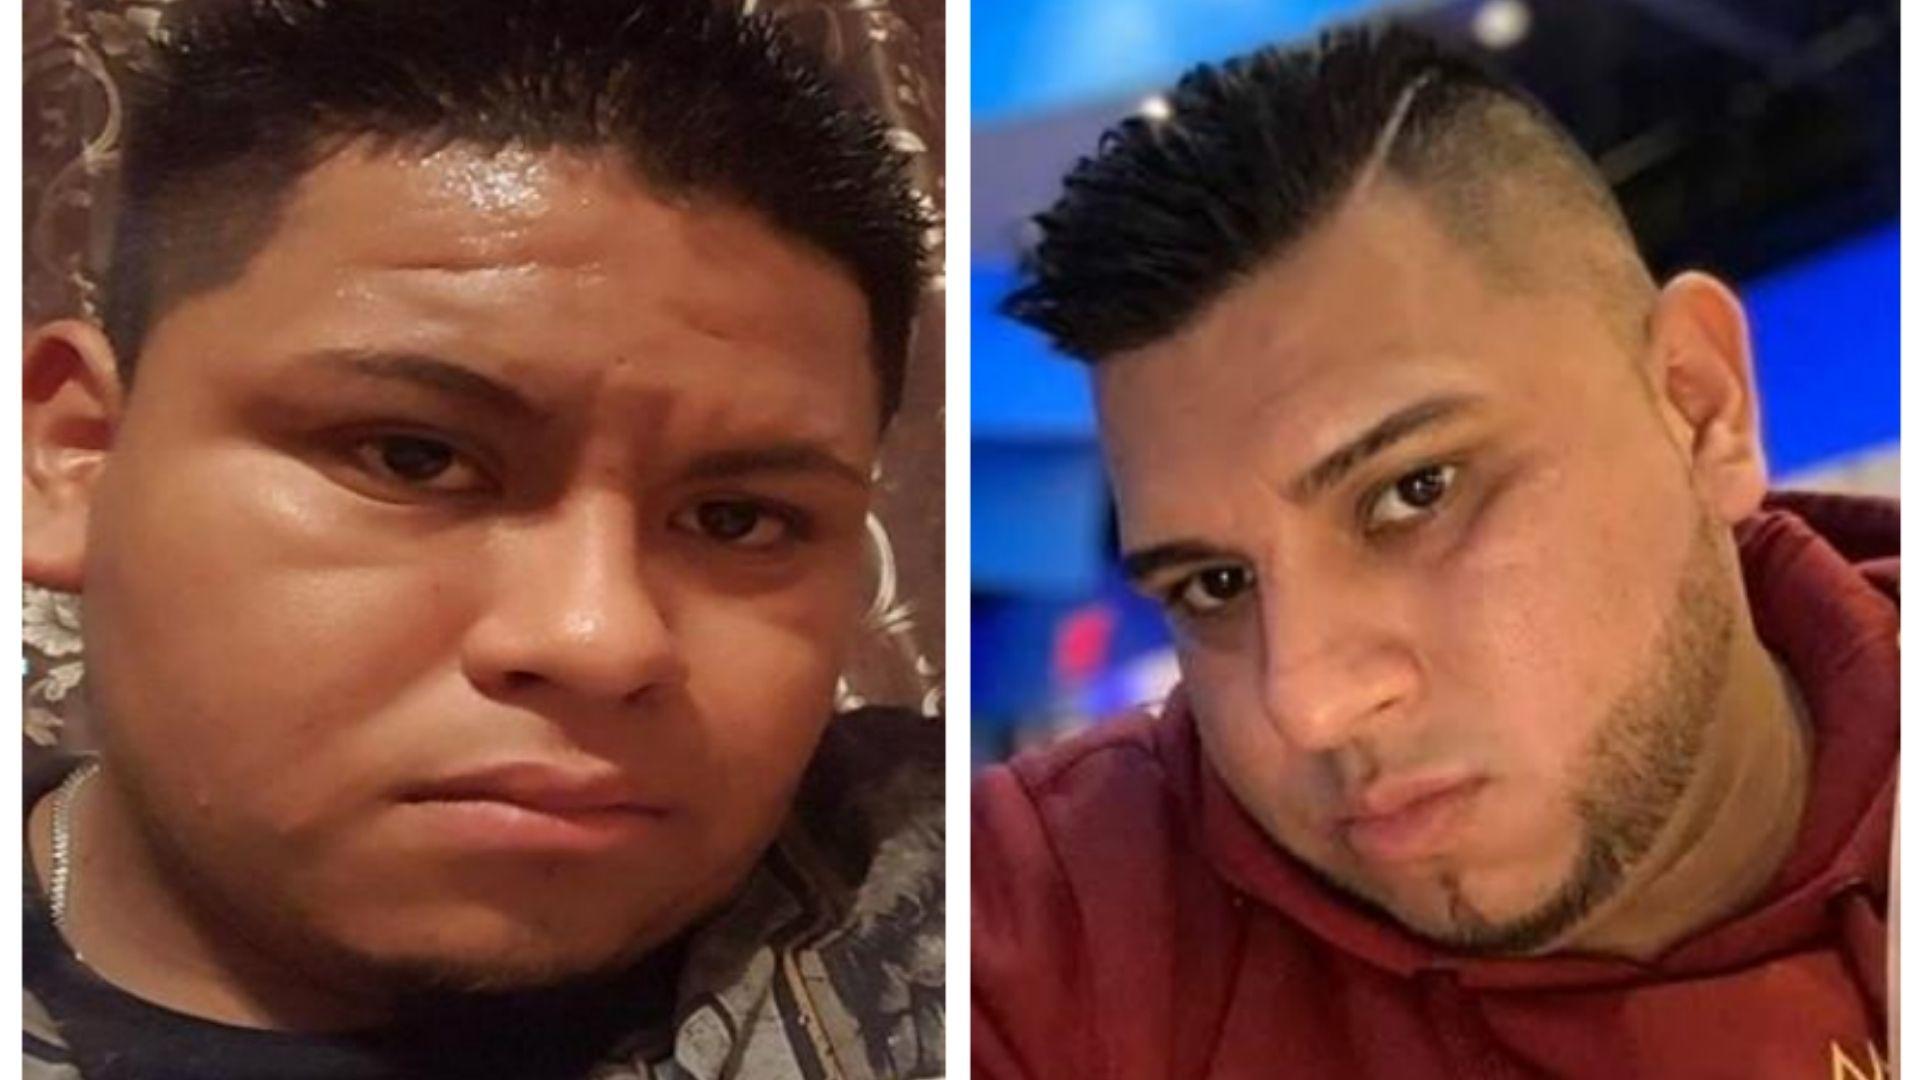 Martinez-Garcia brothers